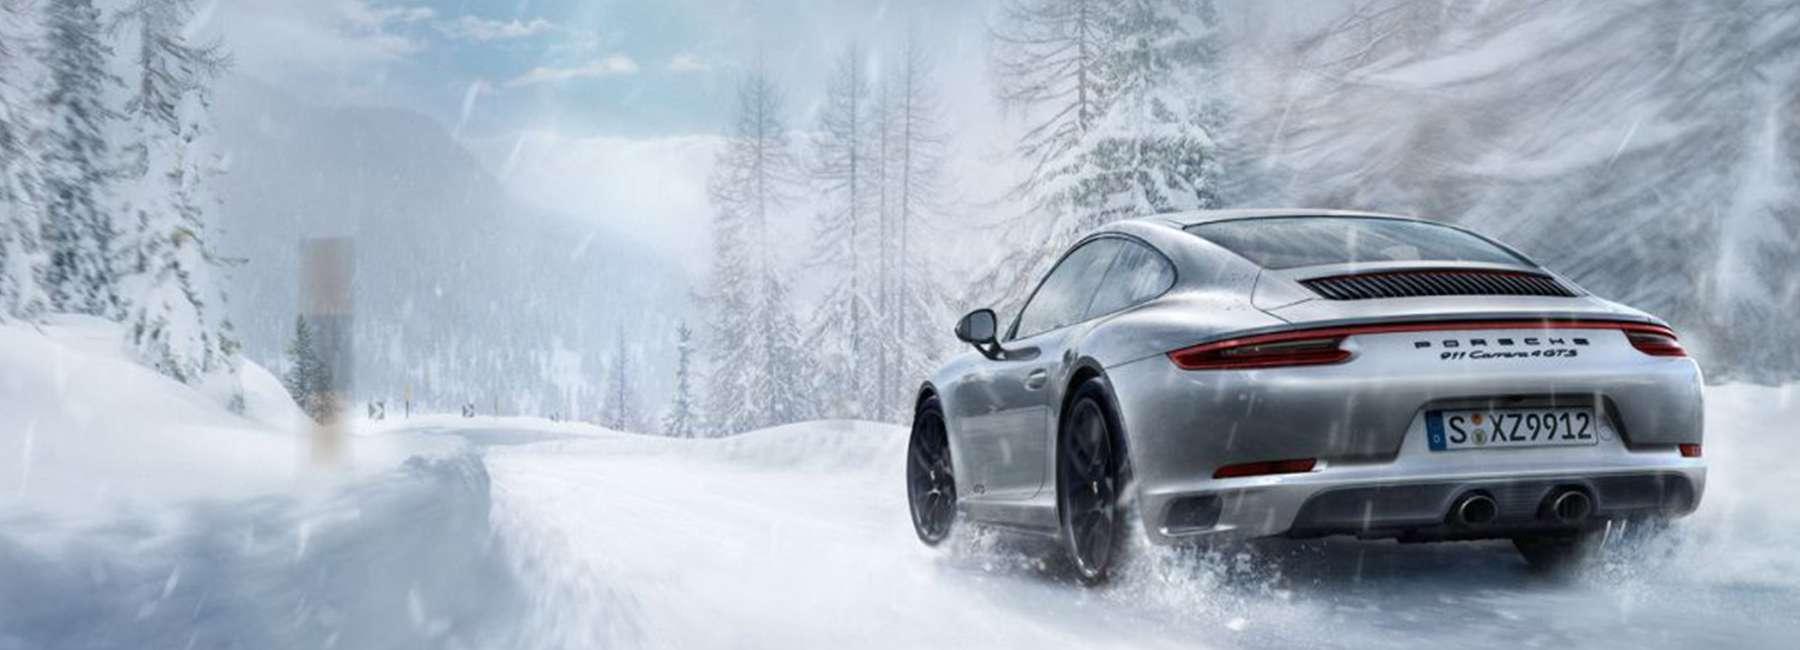 Porsche Winter Tires